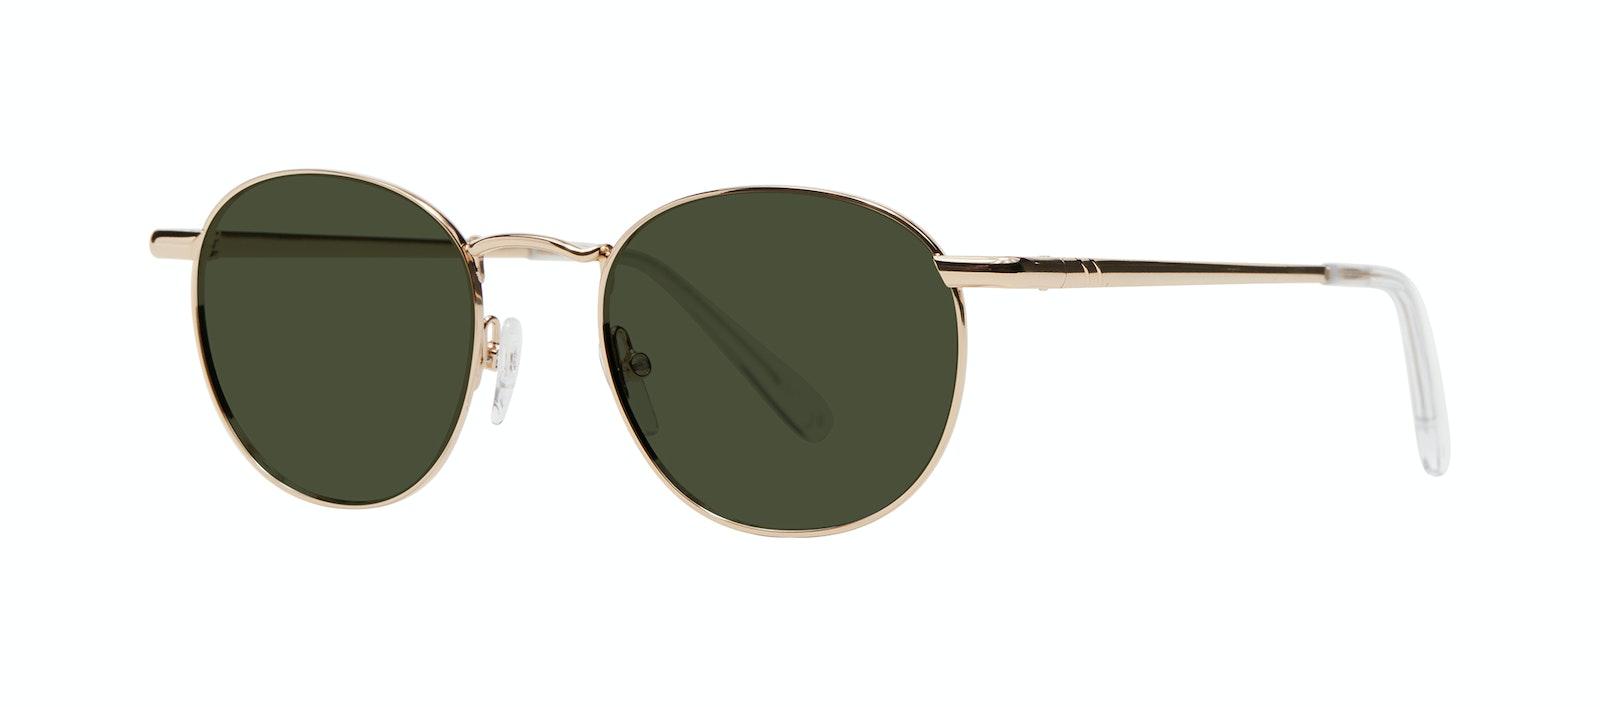 Affordable Fashion Glasses Round Sunglasses Women Divine L Gold Tilt